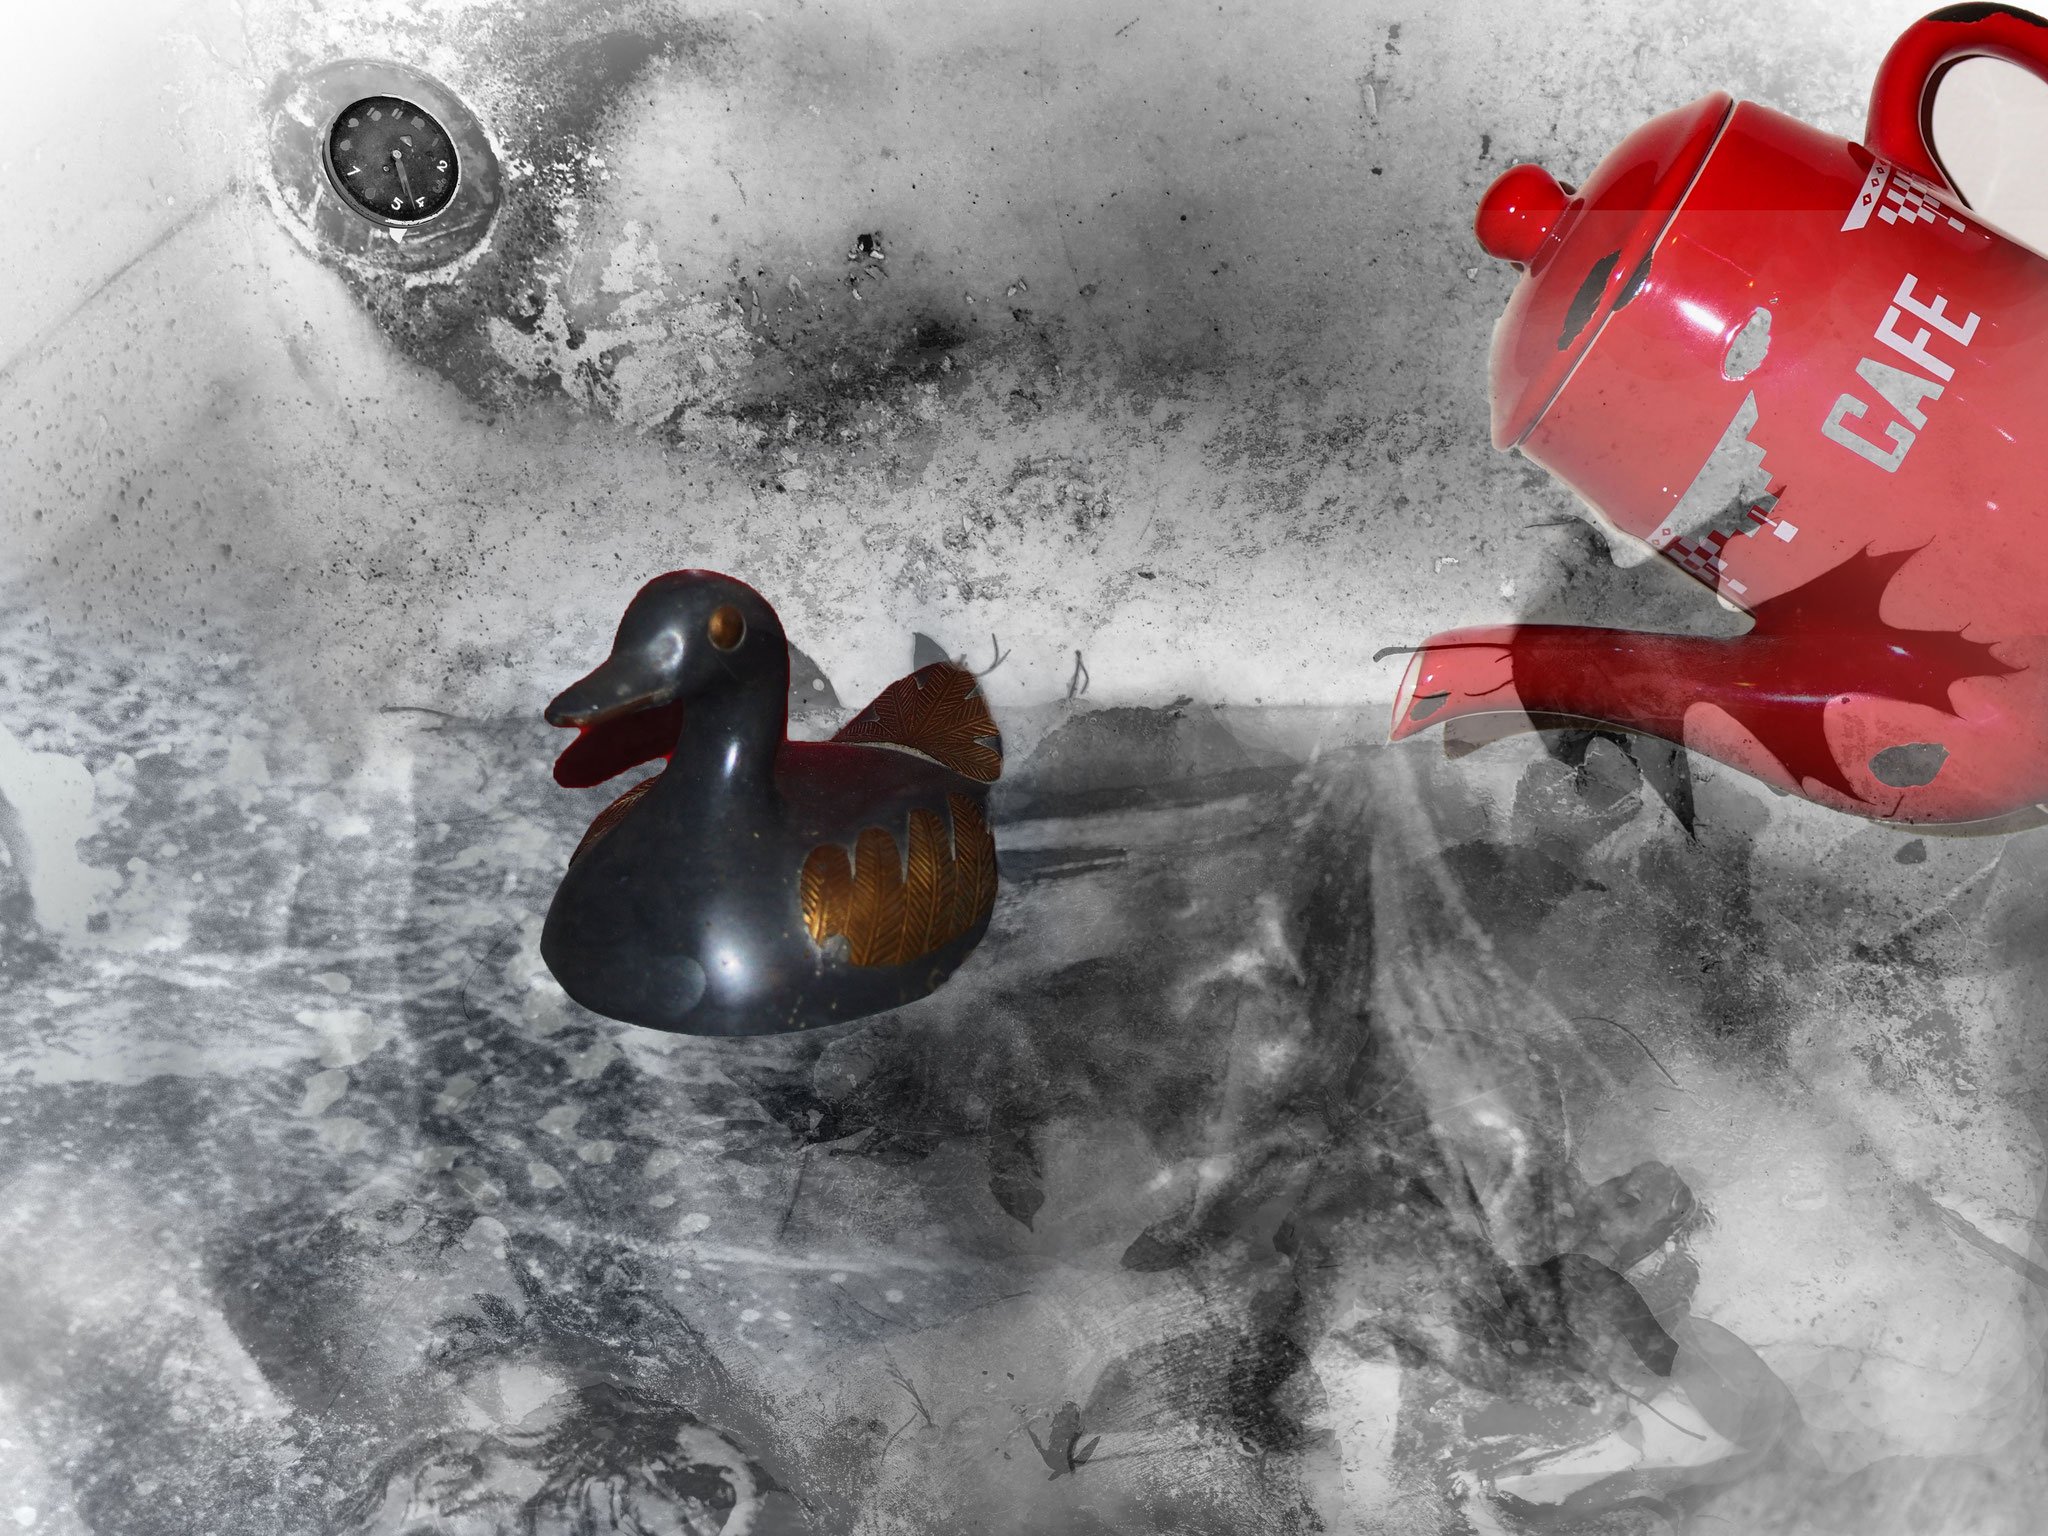 Insoutenable insouciance                                   ©asanuma.brice.cecile